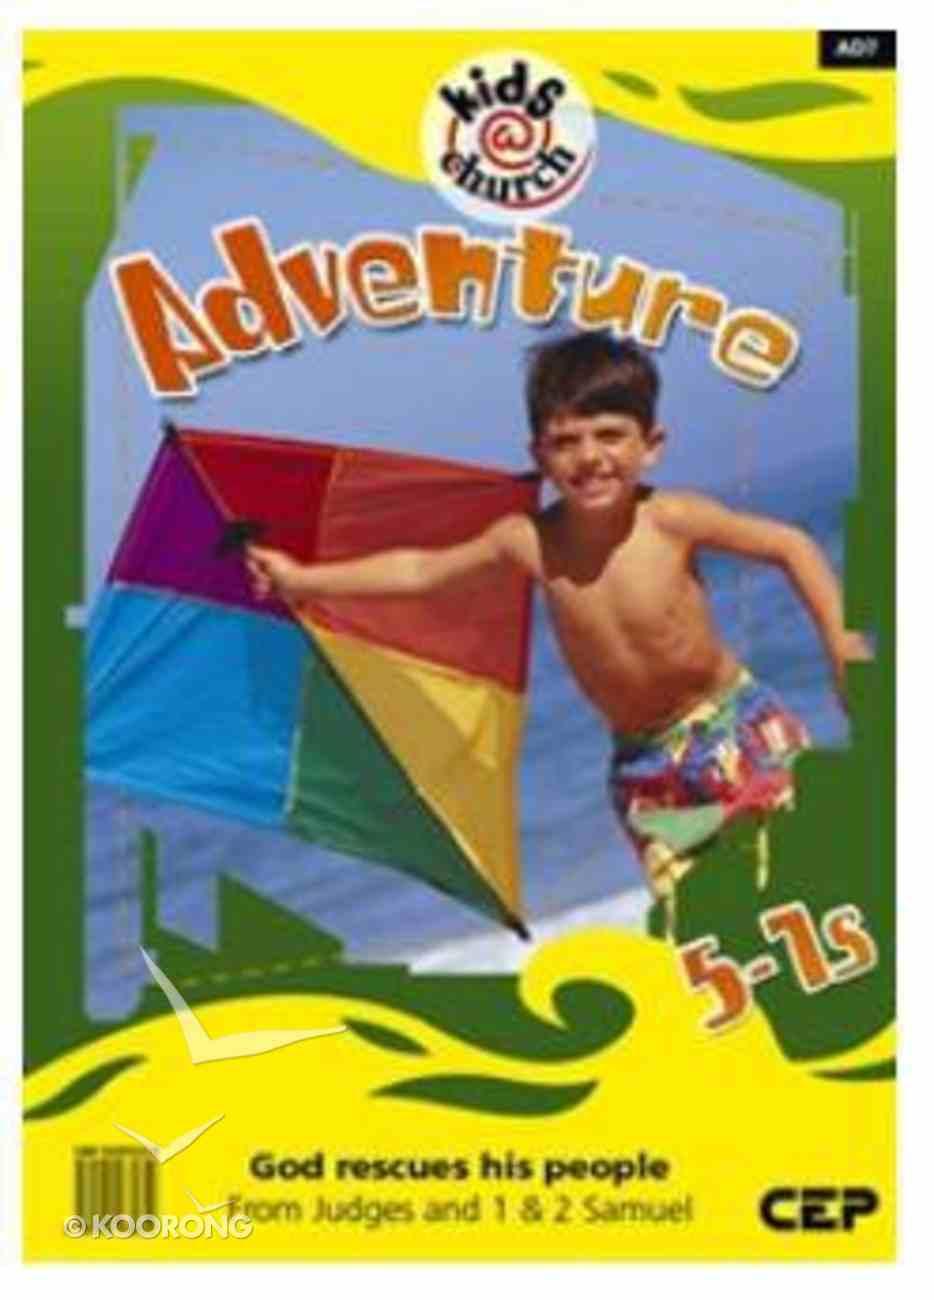 Kids@Church 07: Ad7 Ages 5-7 Teacher's Manual (Adventure) (Kids@church Curriculum Series) Spiral